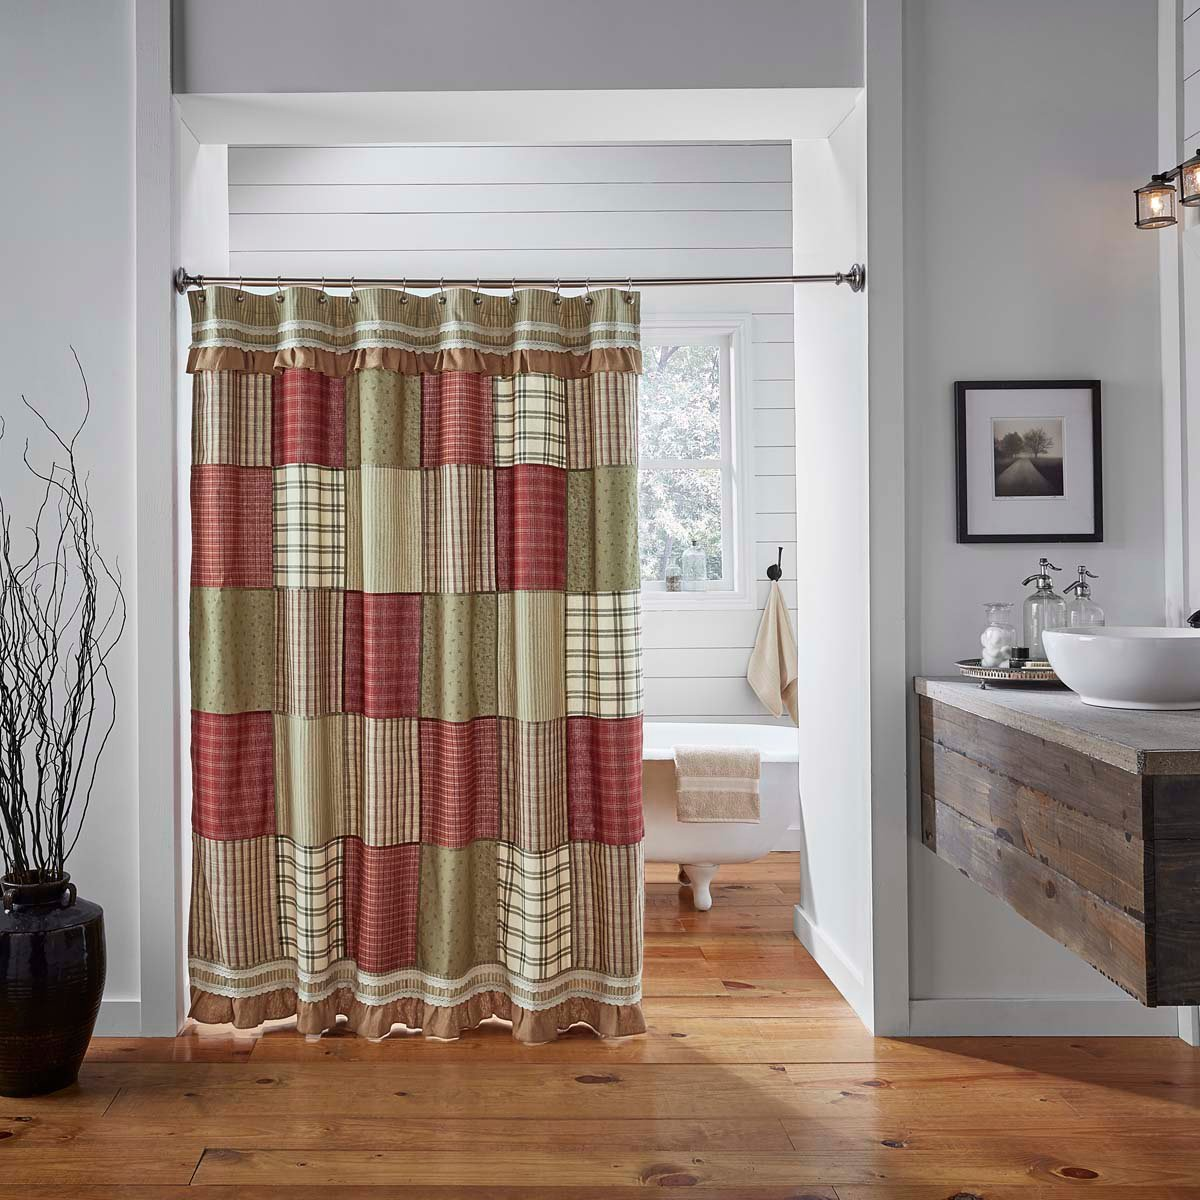 VHC Brands Classic Country Farmhouse Bath Red Shower Curtain, 72 x 72, Prairie Winds